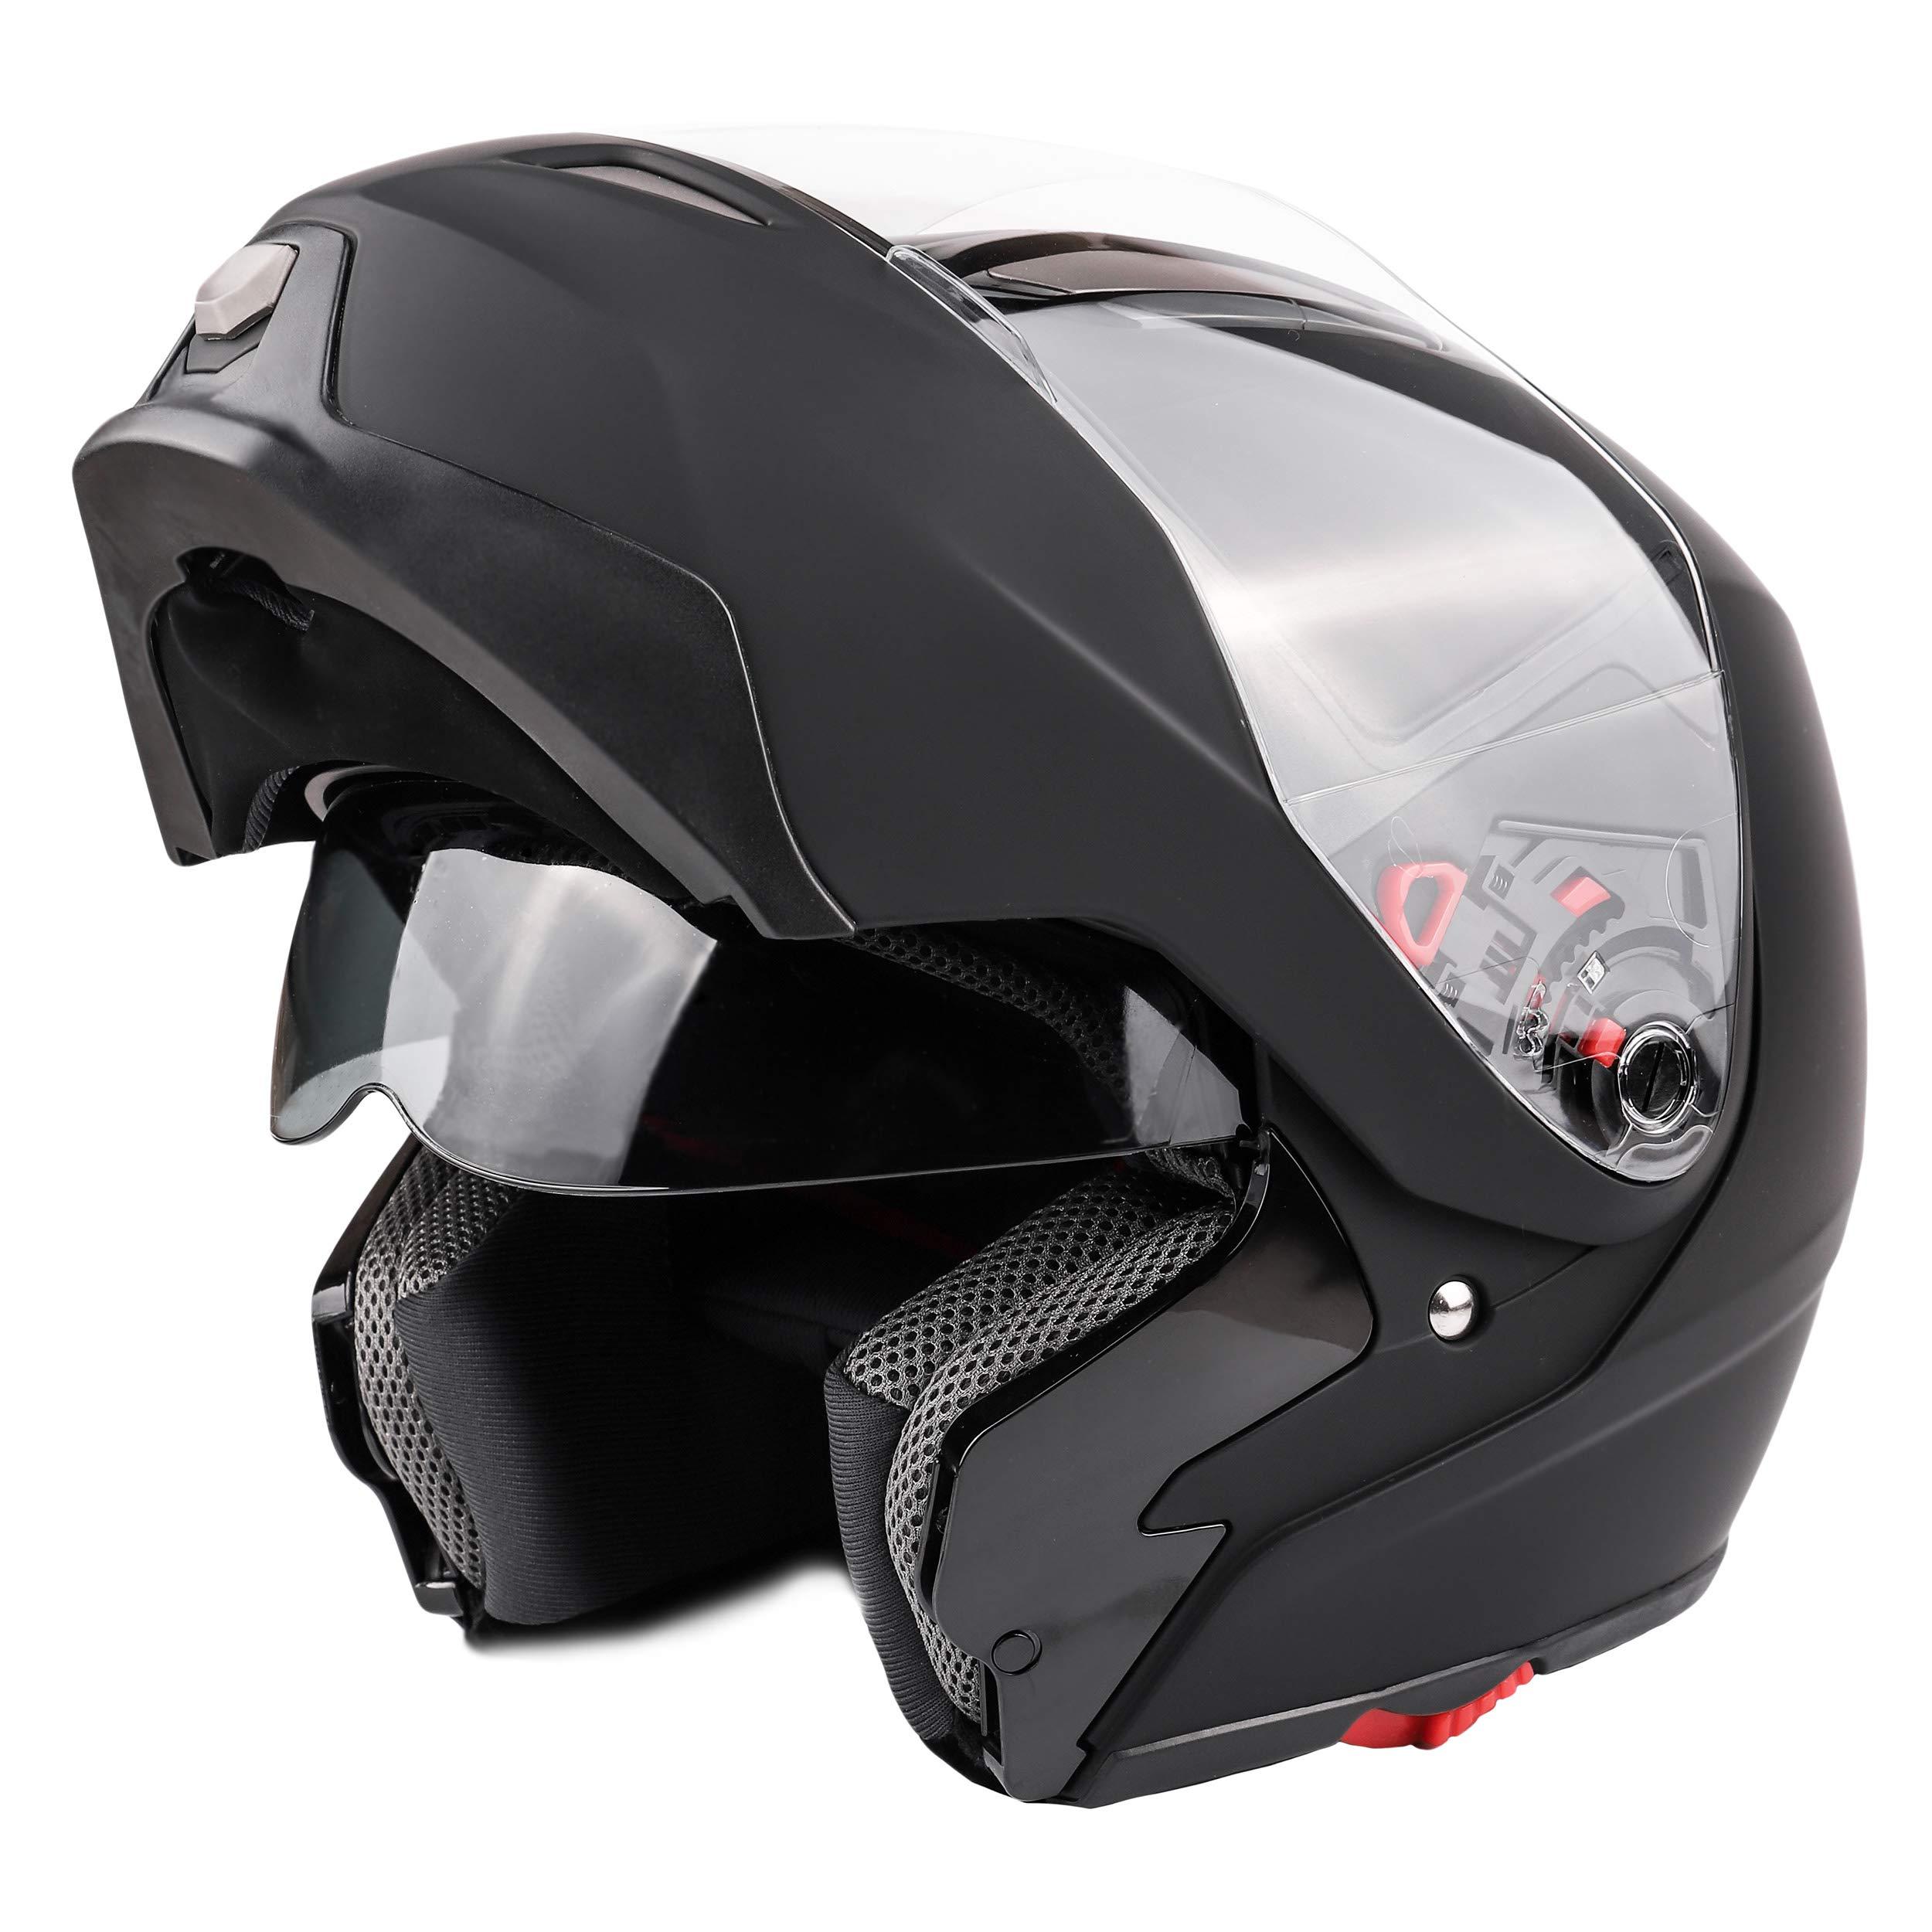 1Storm Motorcycle Street Bike Modular//Flip up Dual Visor//Sun Shield Full Face Helmet GlossyBlue, X-Small